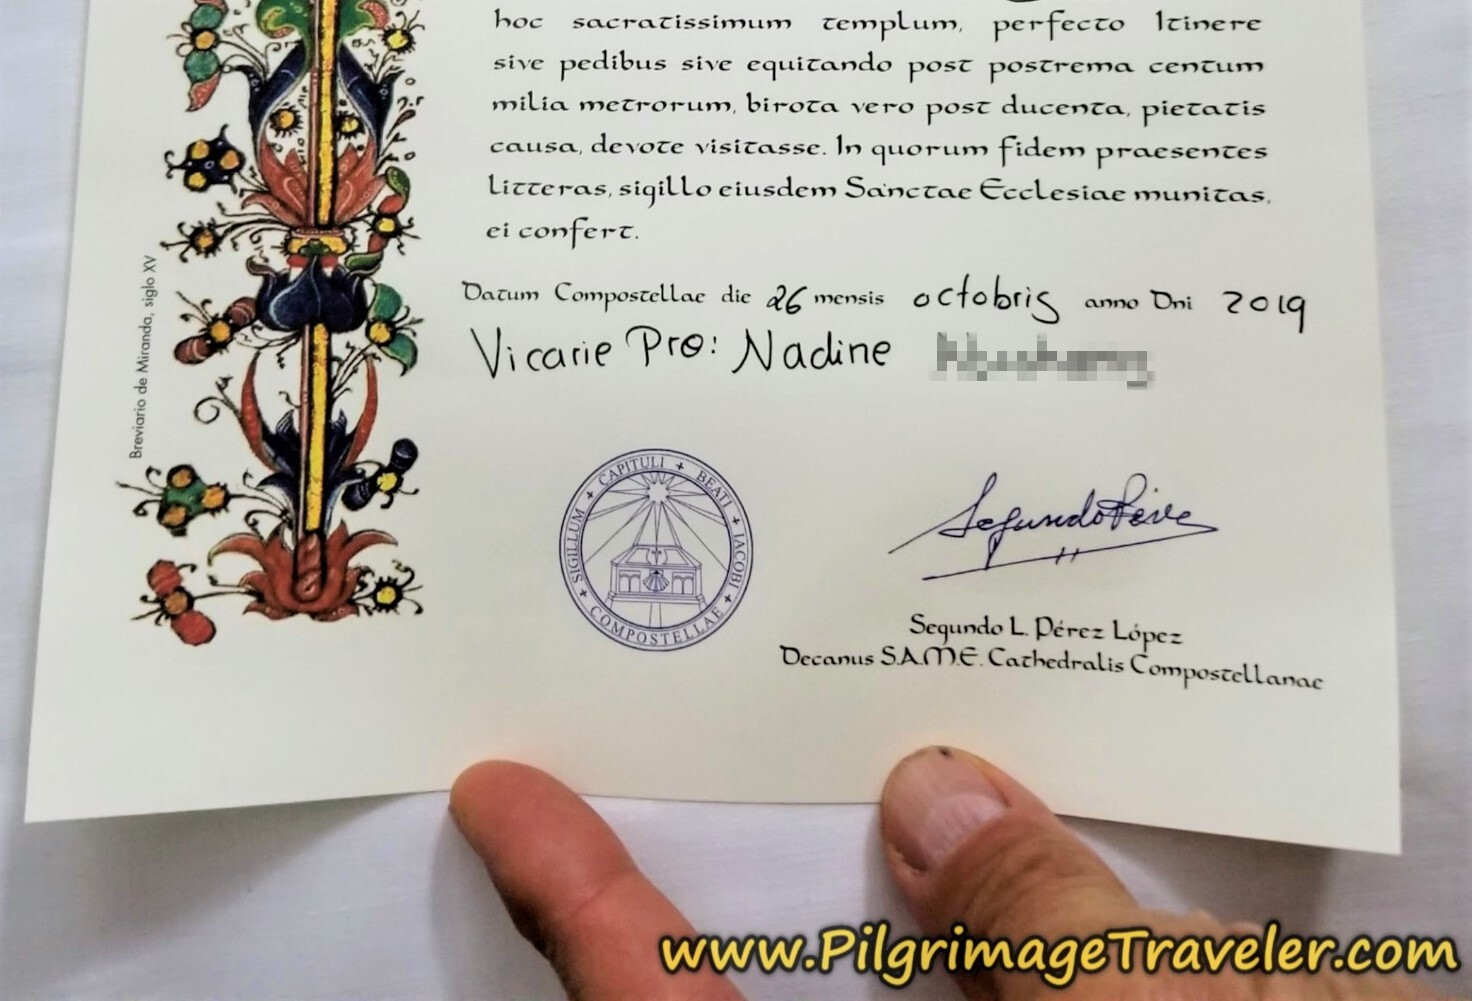 Compostela for Nadine